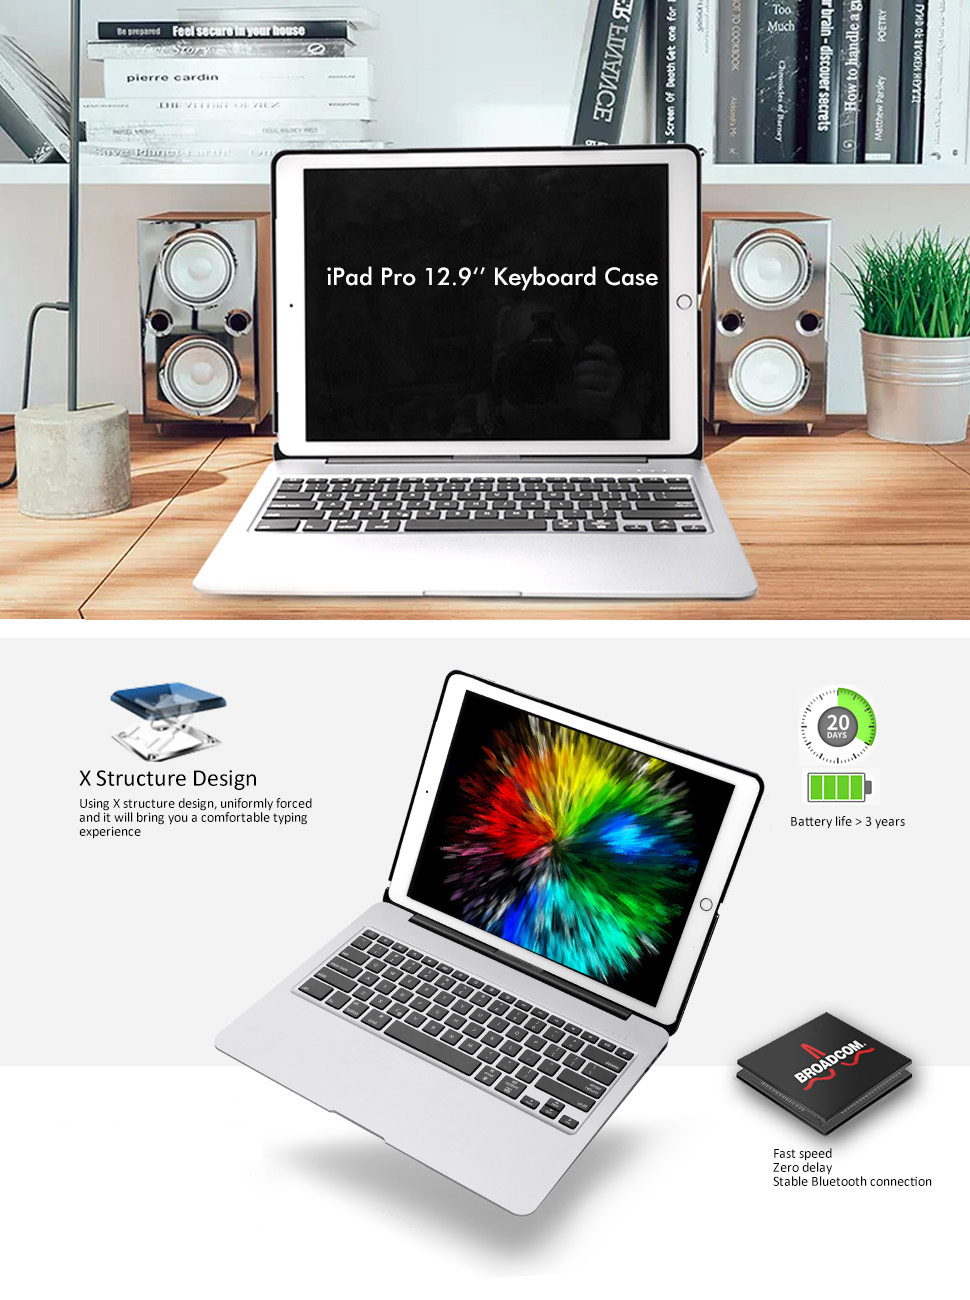 ipad pro12.9 keyboard case (8)